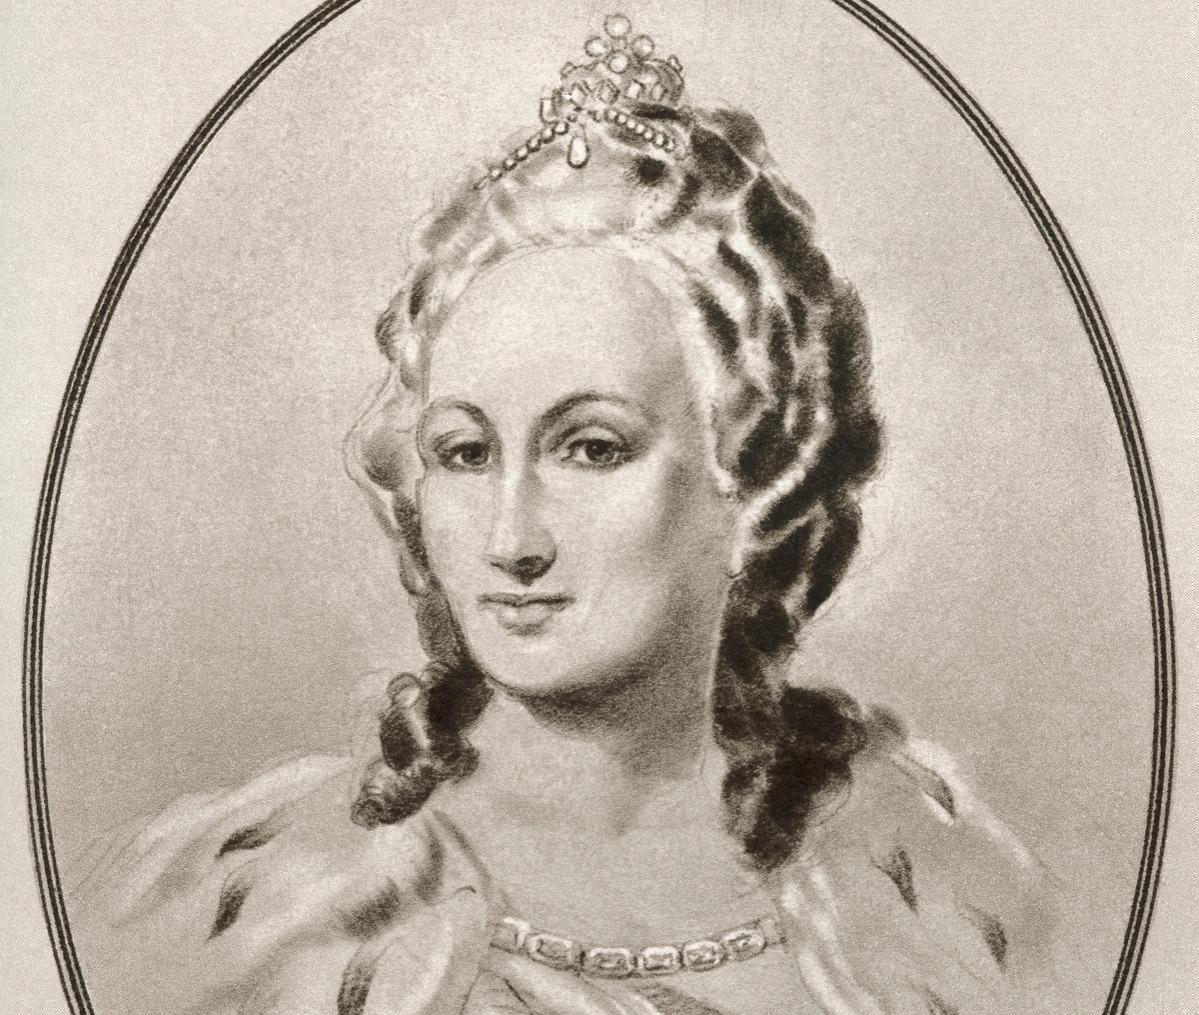 Catherine II, 1729 - 1796, aka Catherine the Great was born as Prussian Sophie von Anhalt-Zerbst